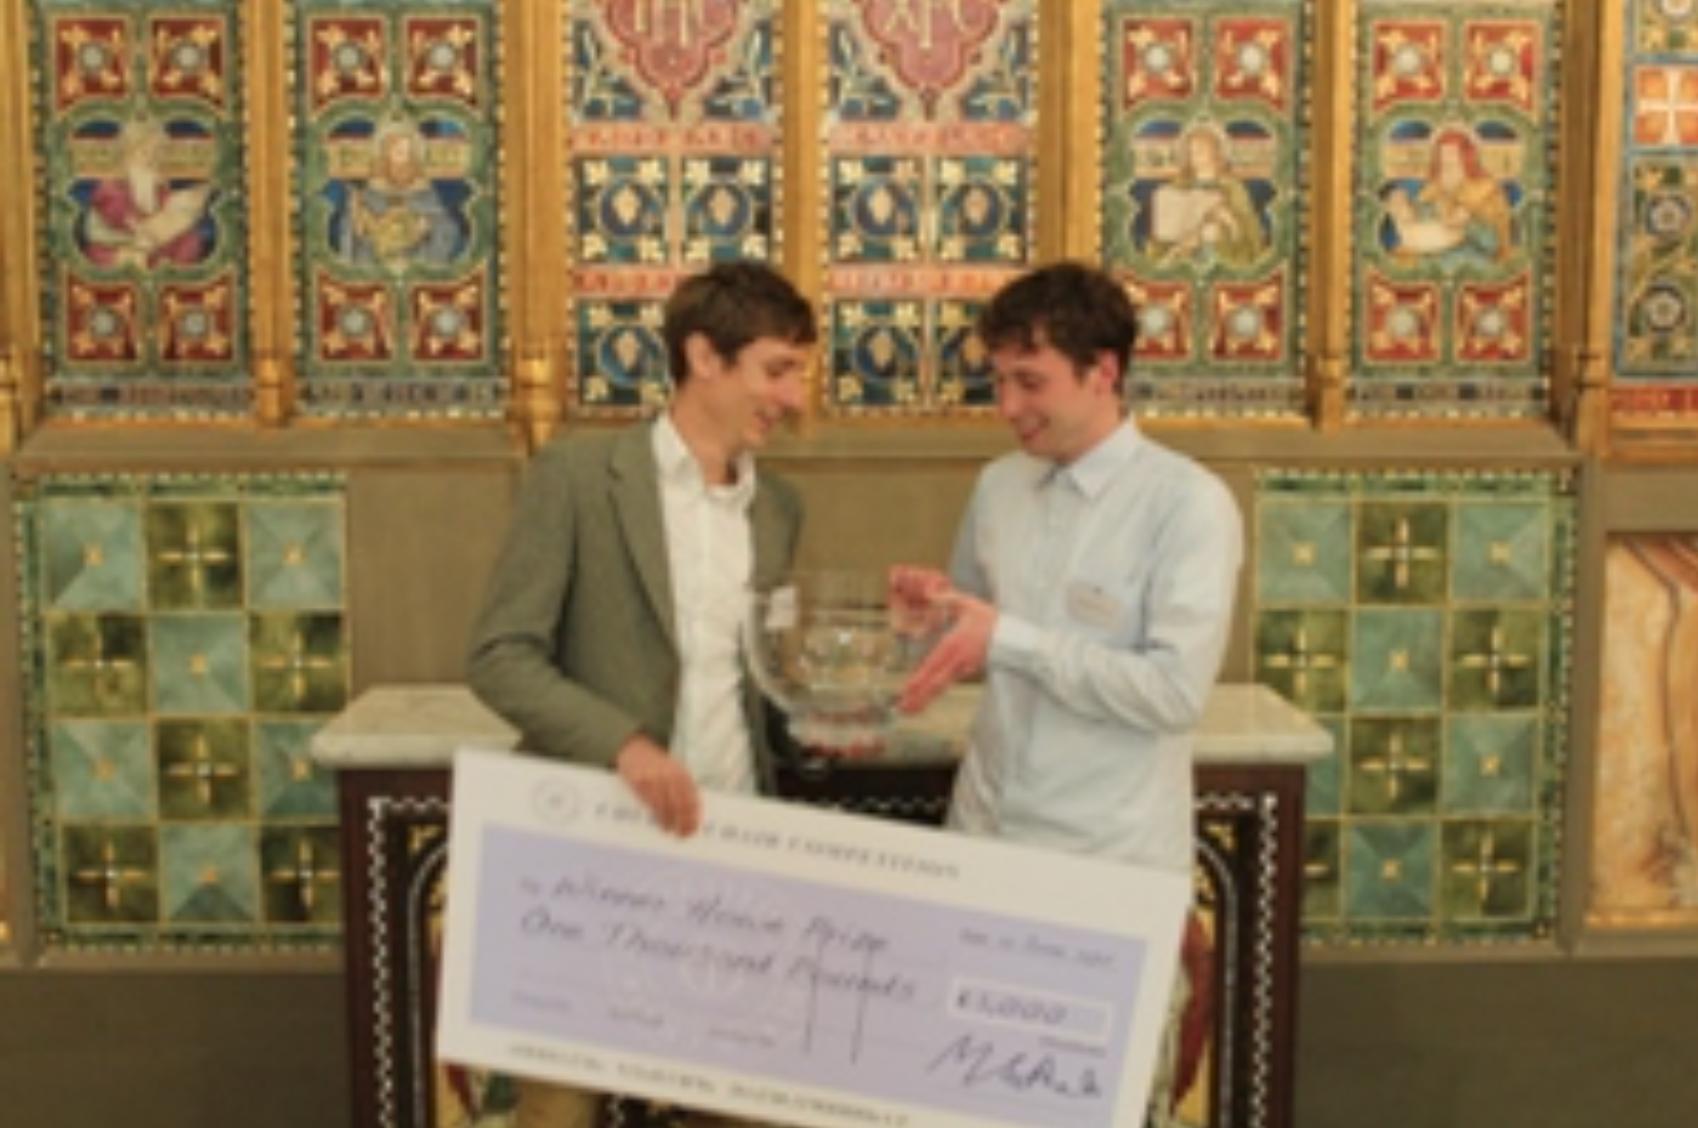 Sebastian Klawiter Nicholas Shurey church chair competition church of england